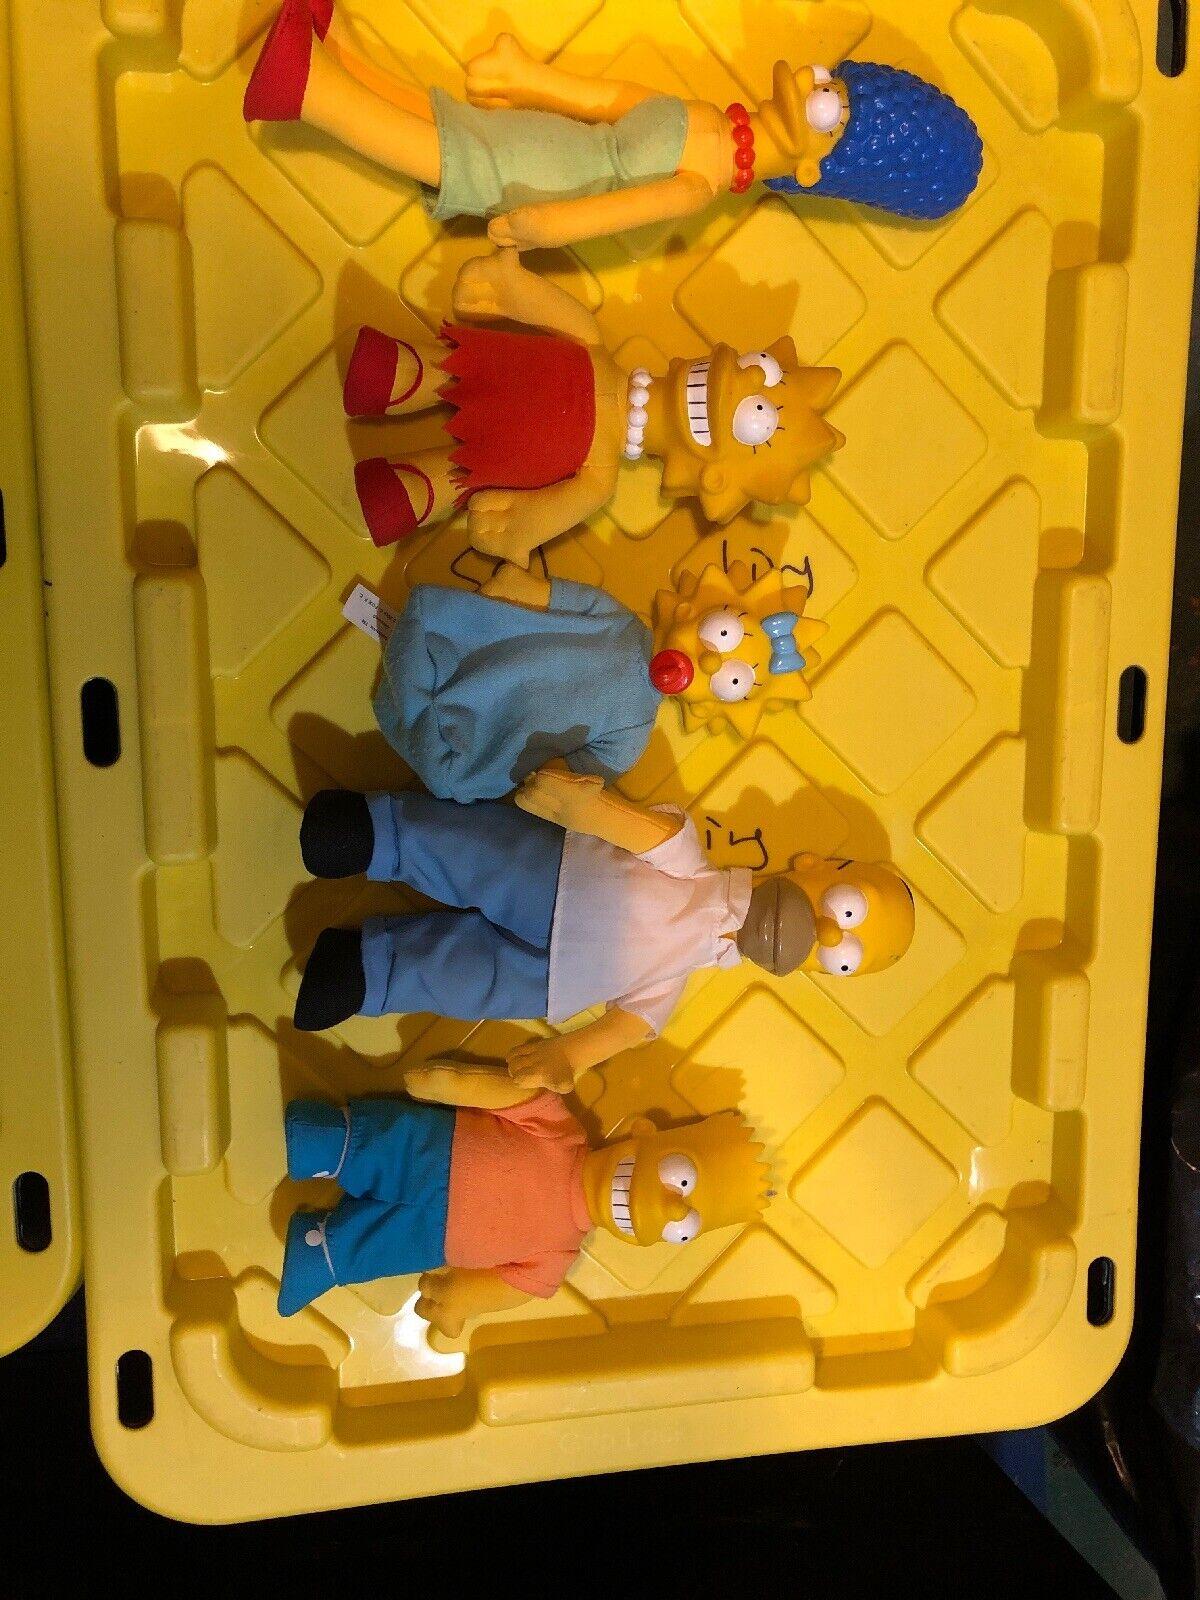 Juego de los Simpsons Familia Muñeco de Peluche Cabeza De Vinilo 1990 Matt Matt Groening 20th Century Fox +